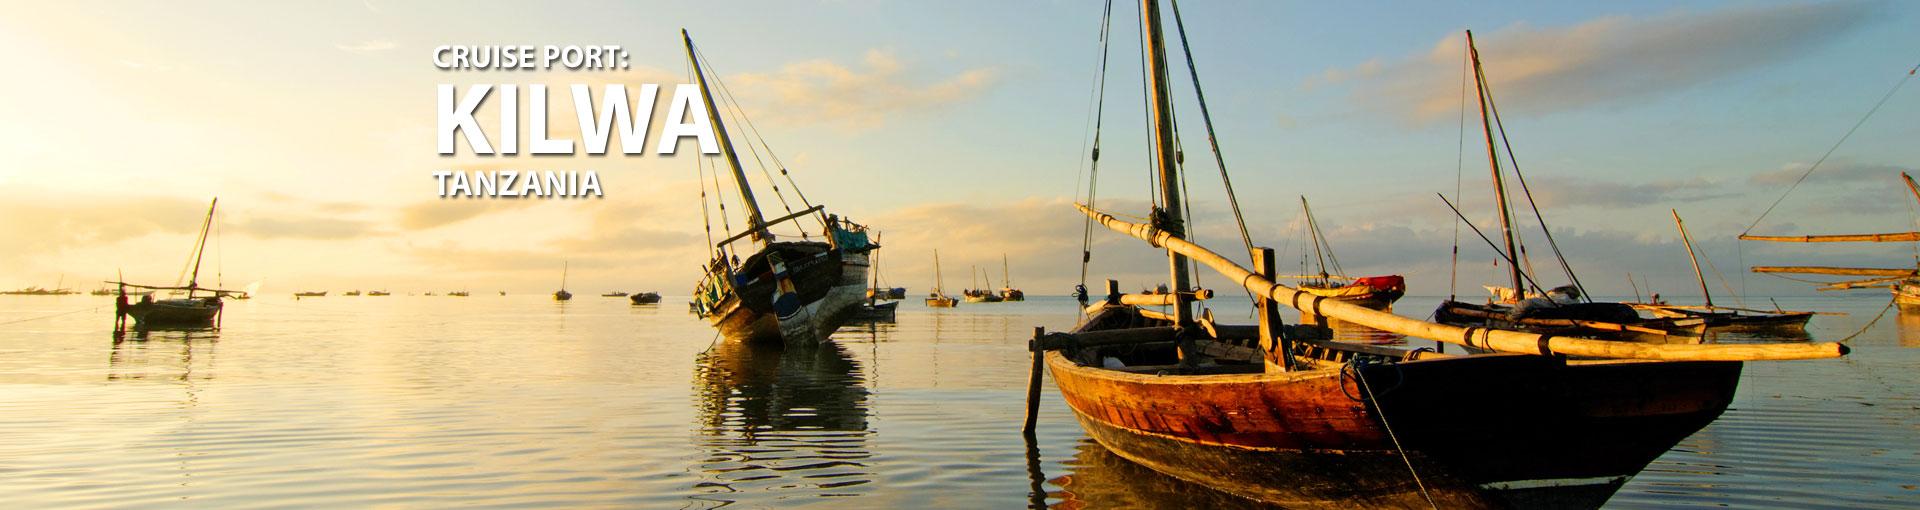 Cruises to Kilwa, Tanzania